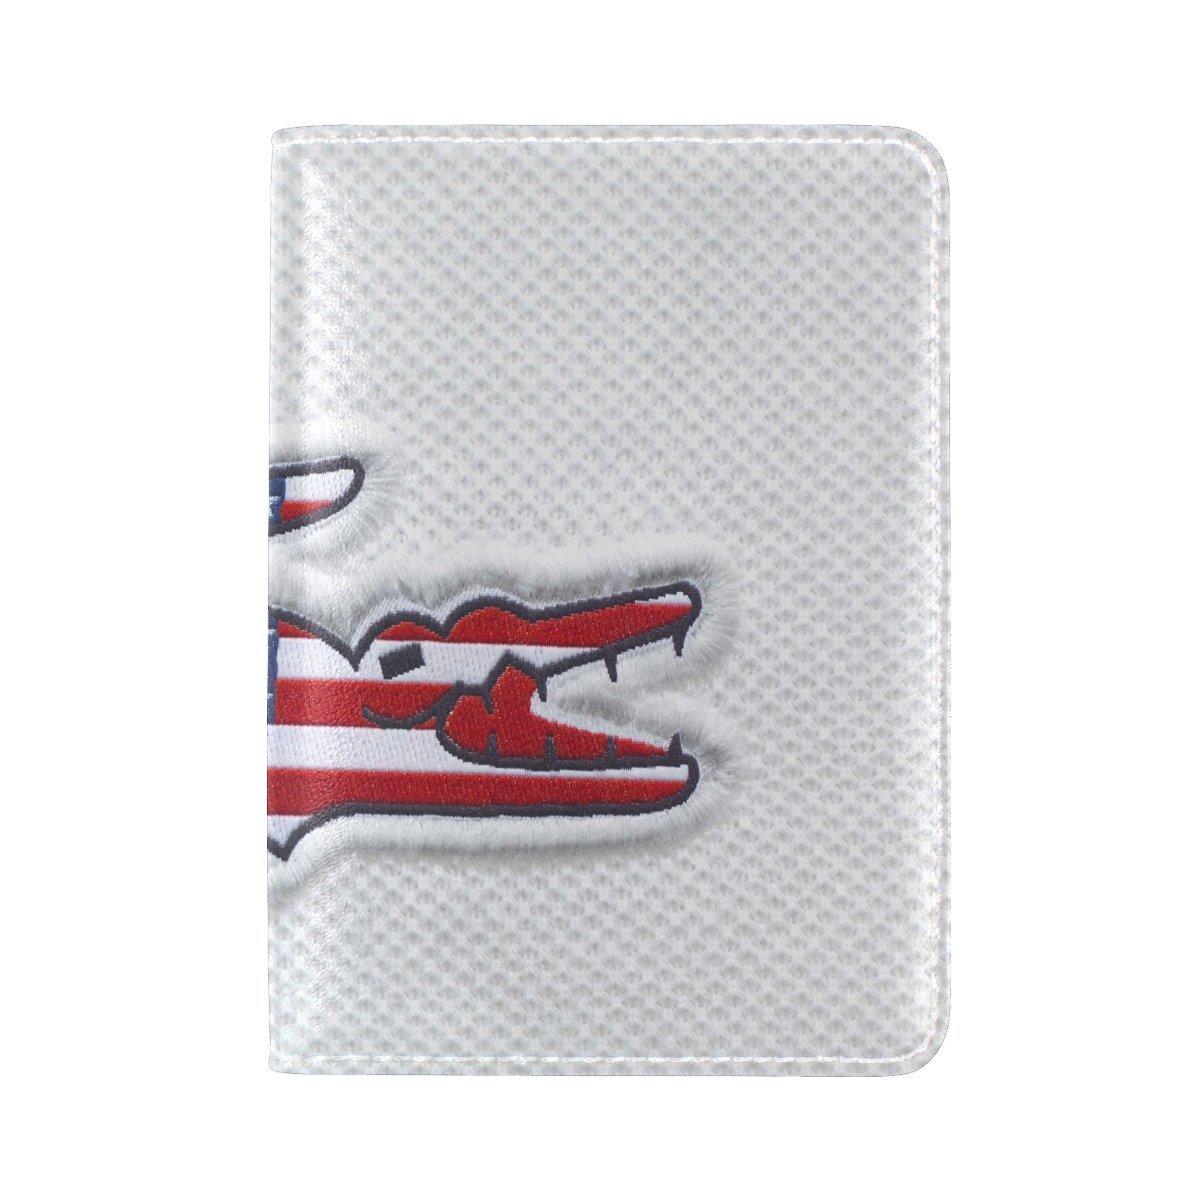 Lacoste Us Flag Brand Crocodile Logo Leather Passport Holder Cover Case Travel One Pocket